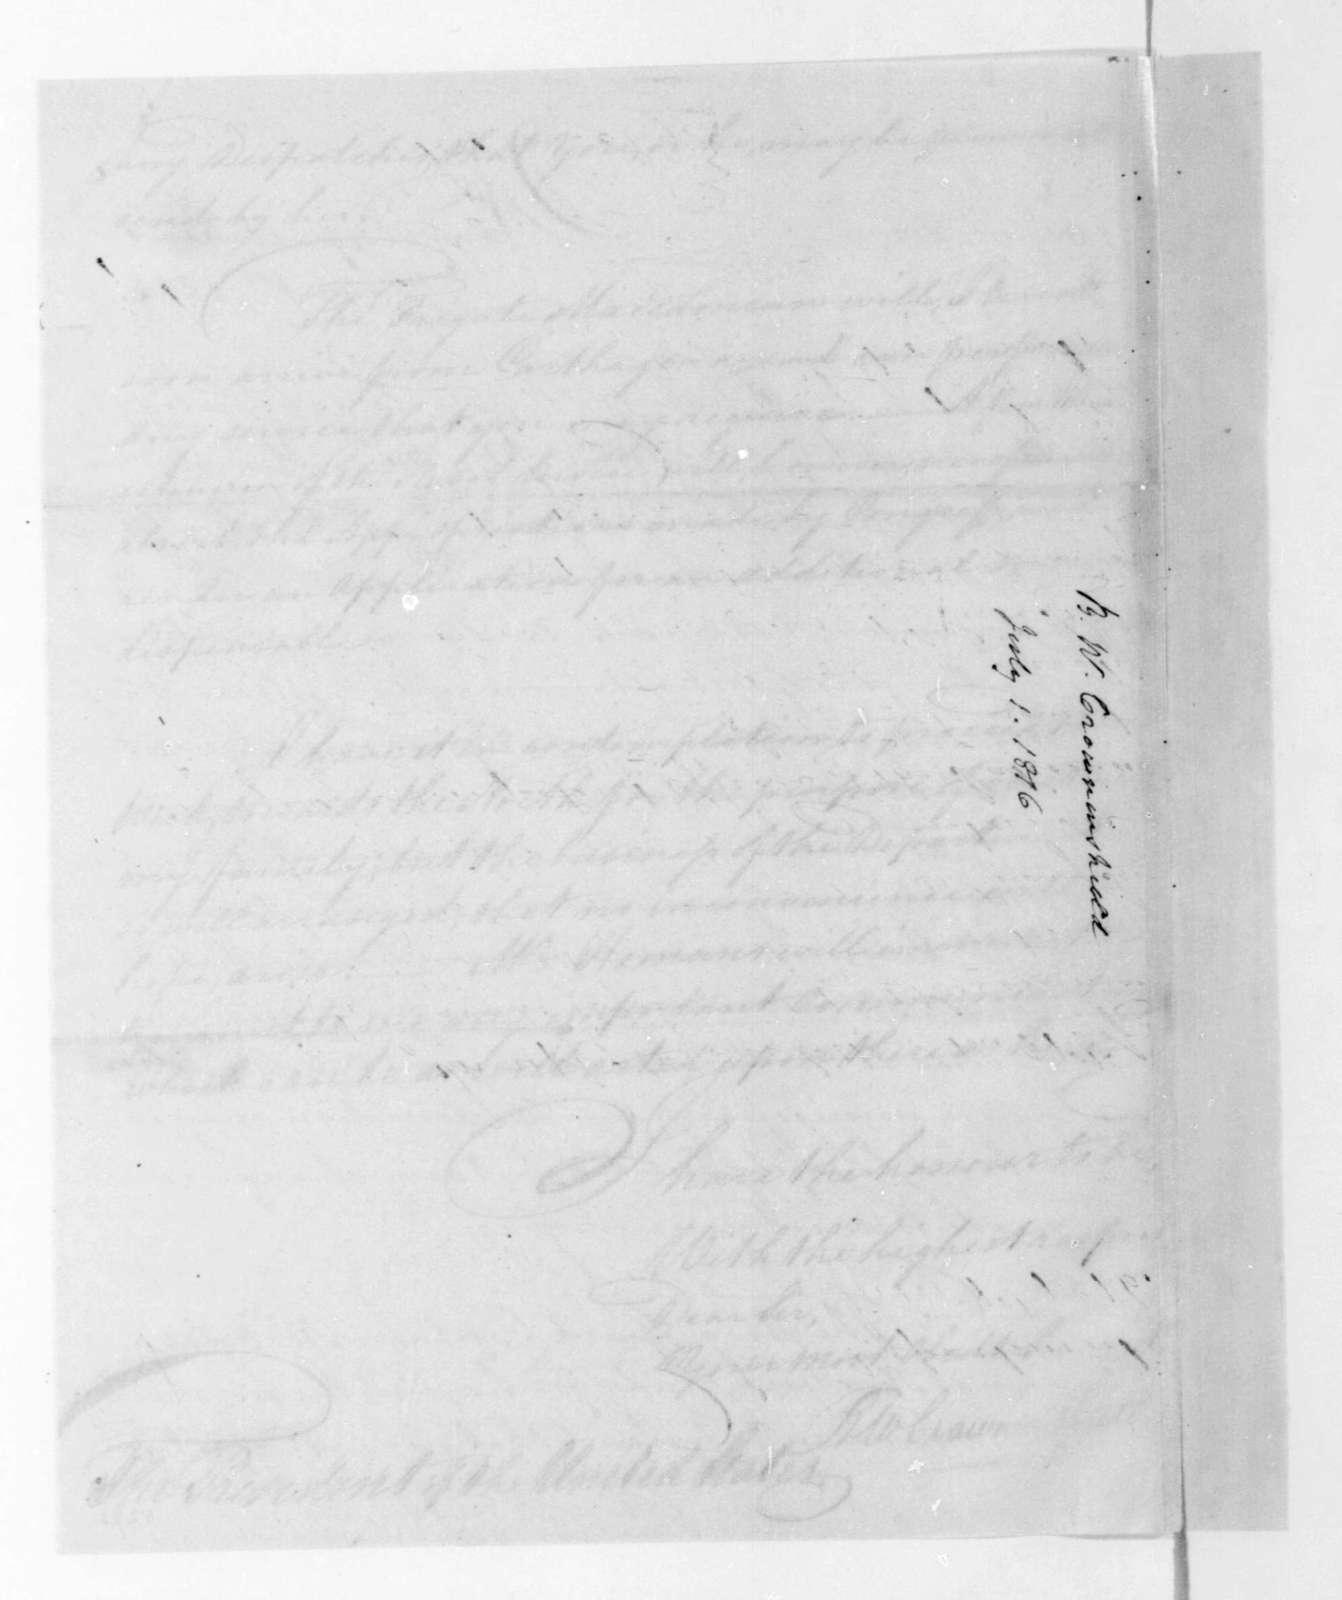 Benjamin W. Crowninshield to James Madison, July 1, 1816.